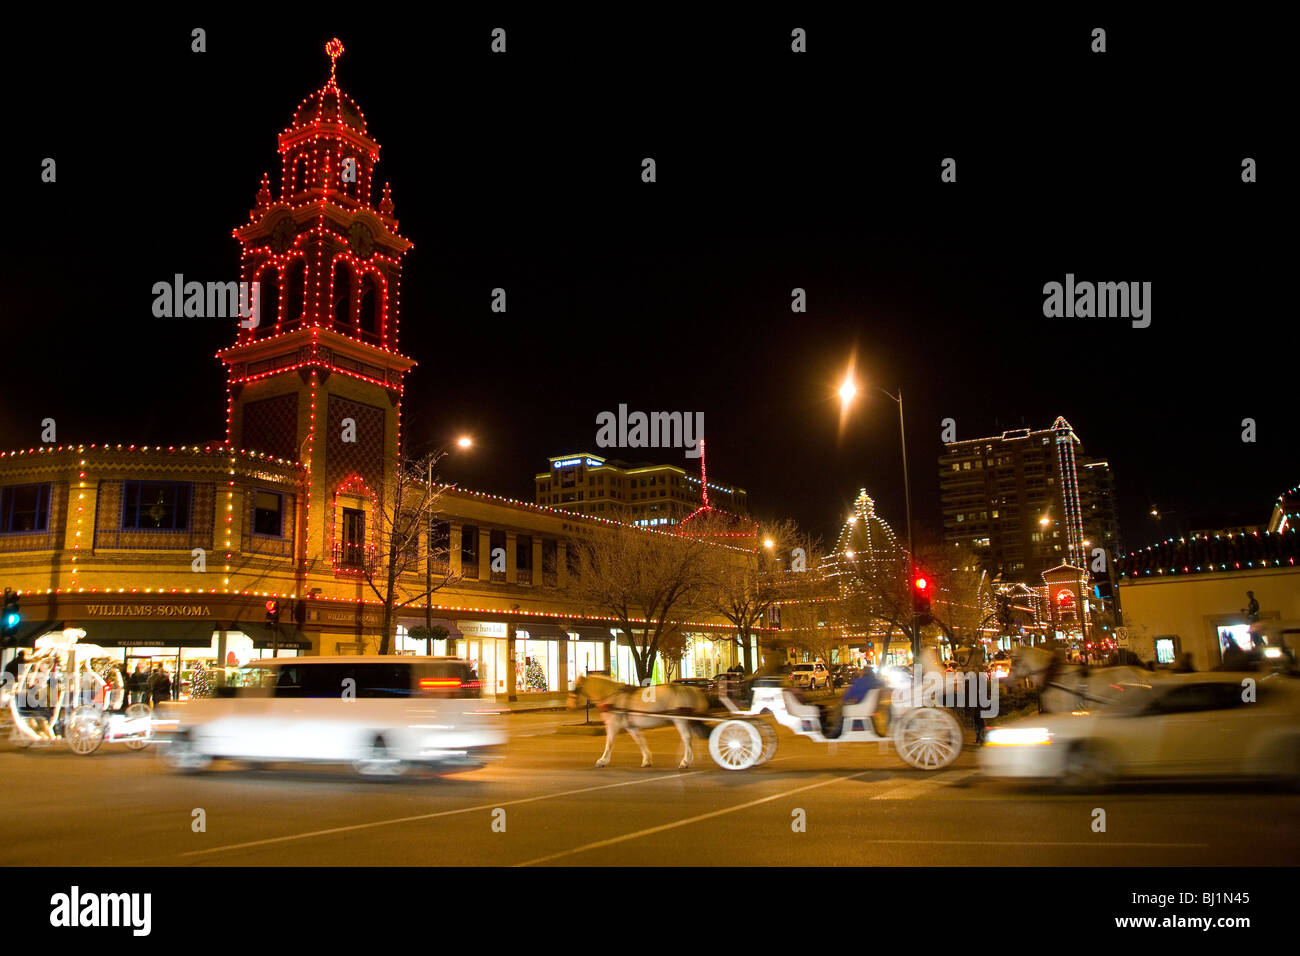 Lumières de Noël Country Club Plaza de Kansas City, Missouri Photo Stock